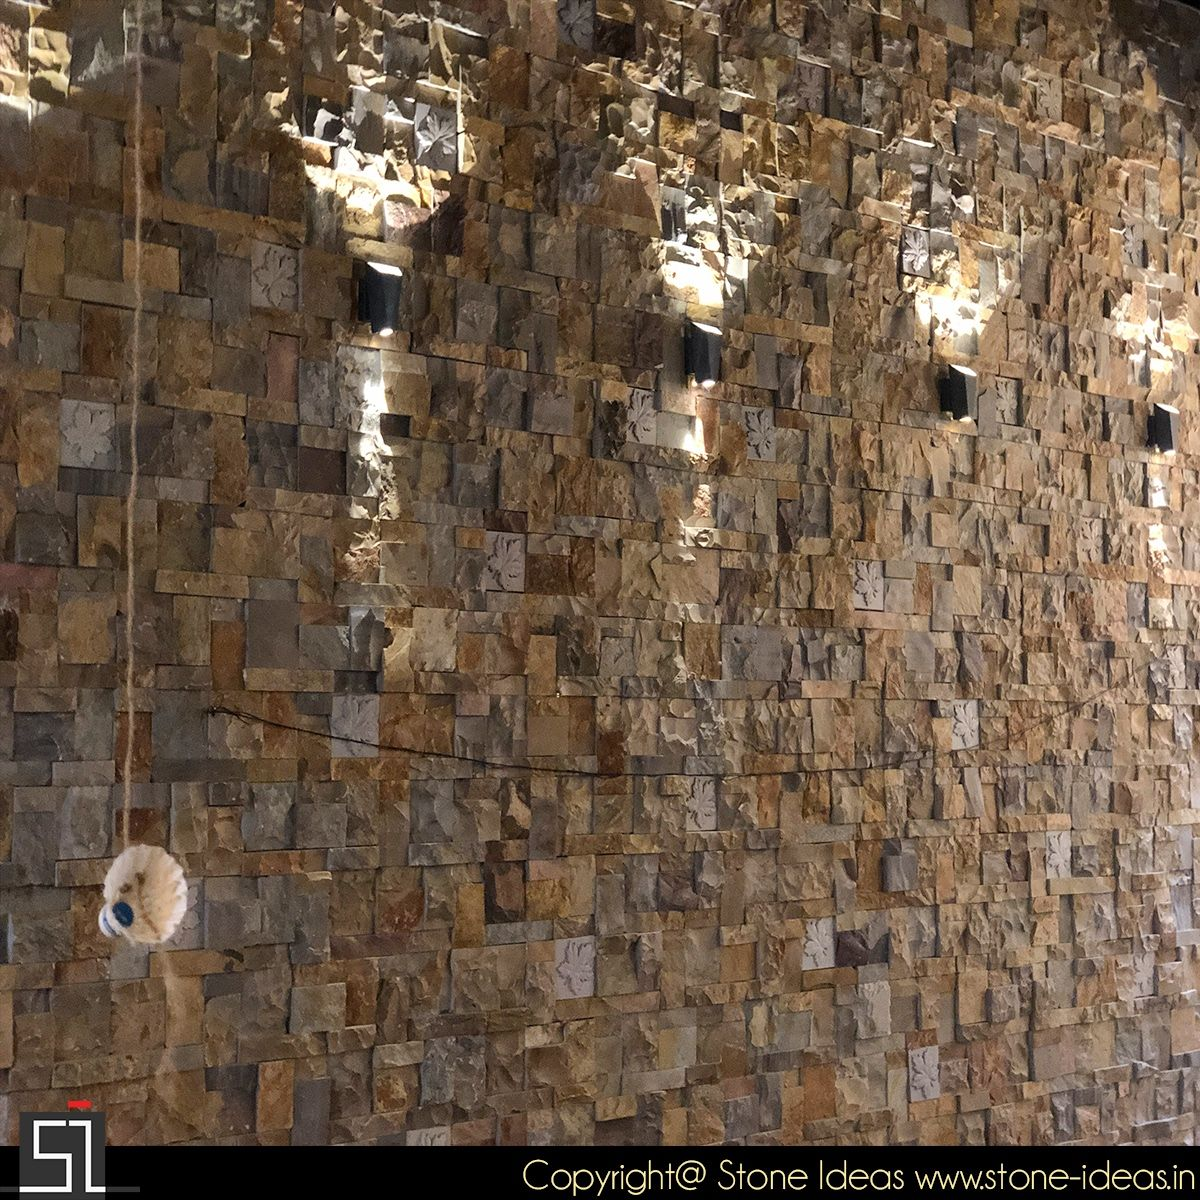 Wall Cladding Tiles Stone Wall Cladding Wall Cladding Tiles Tile Cladding